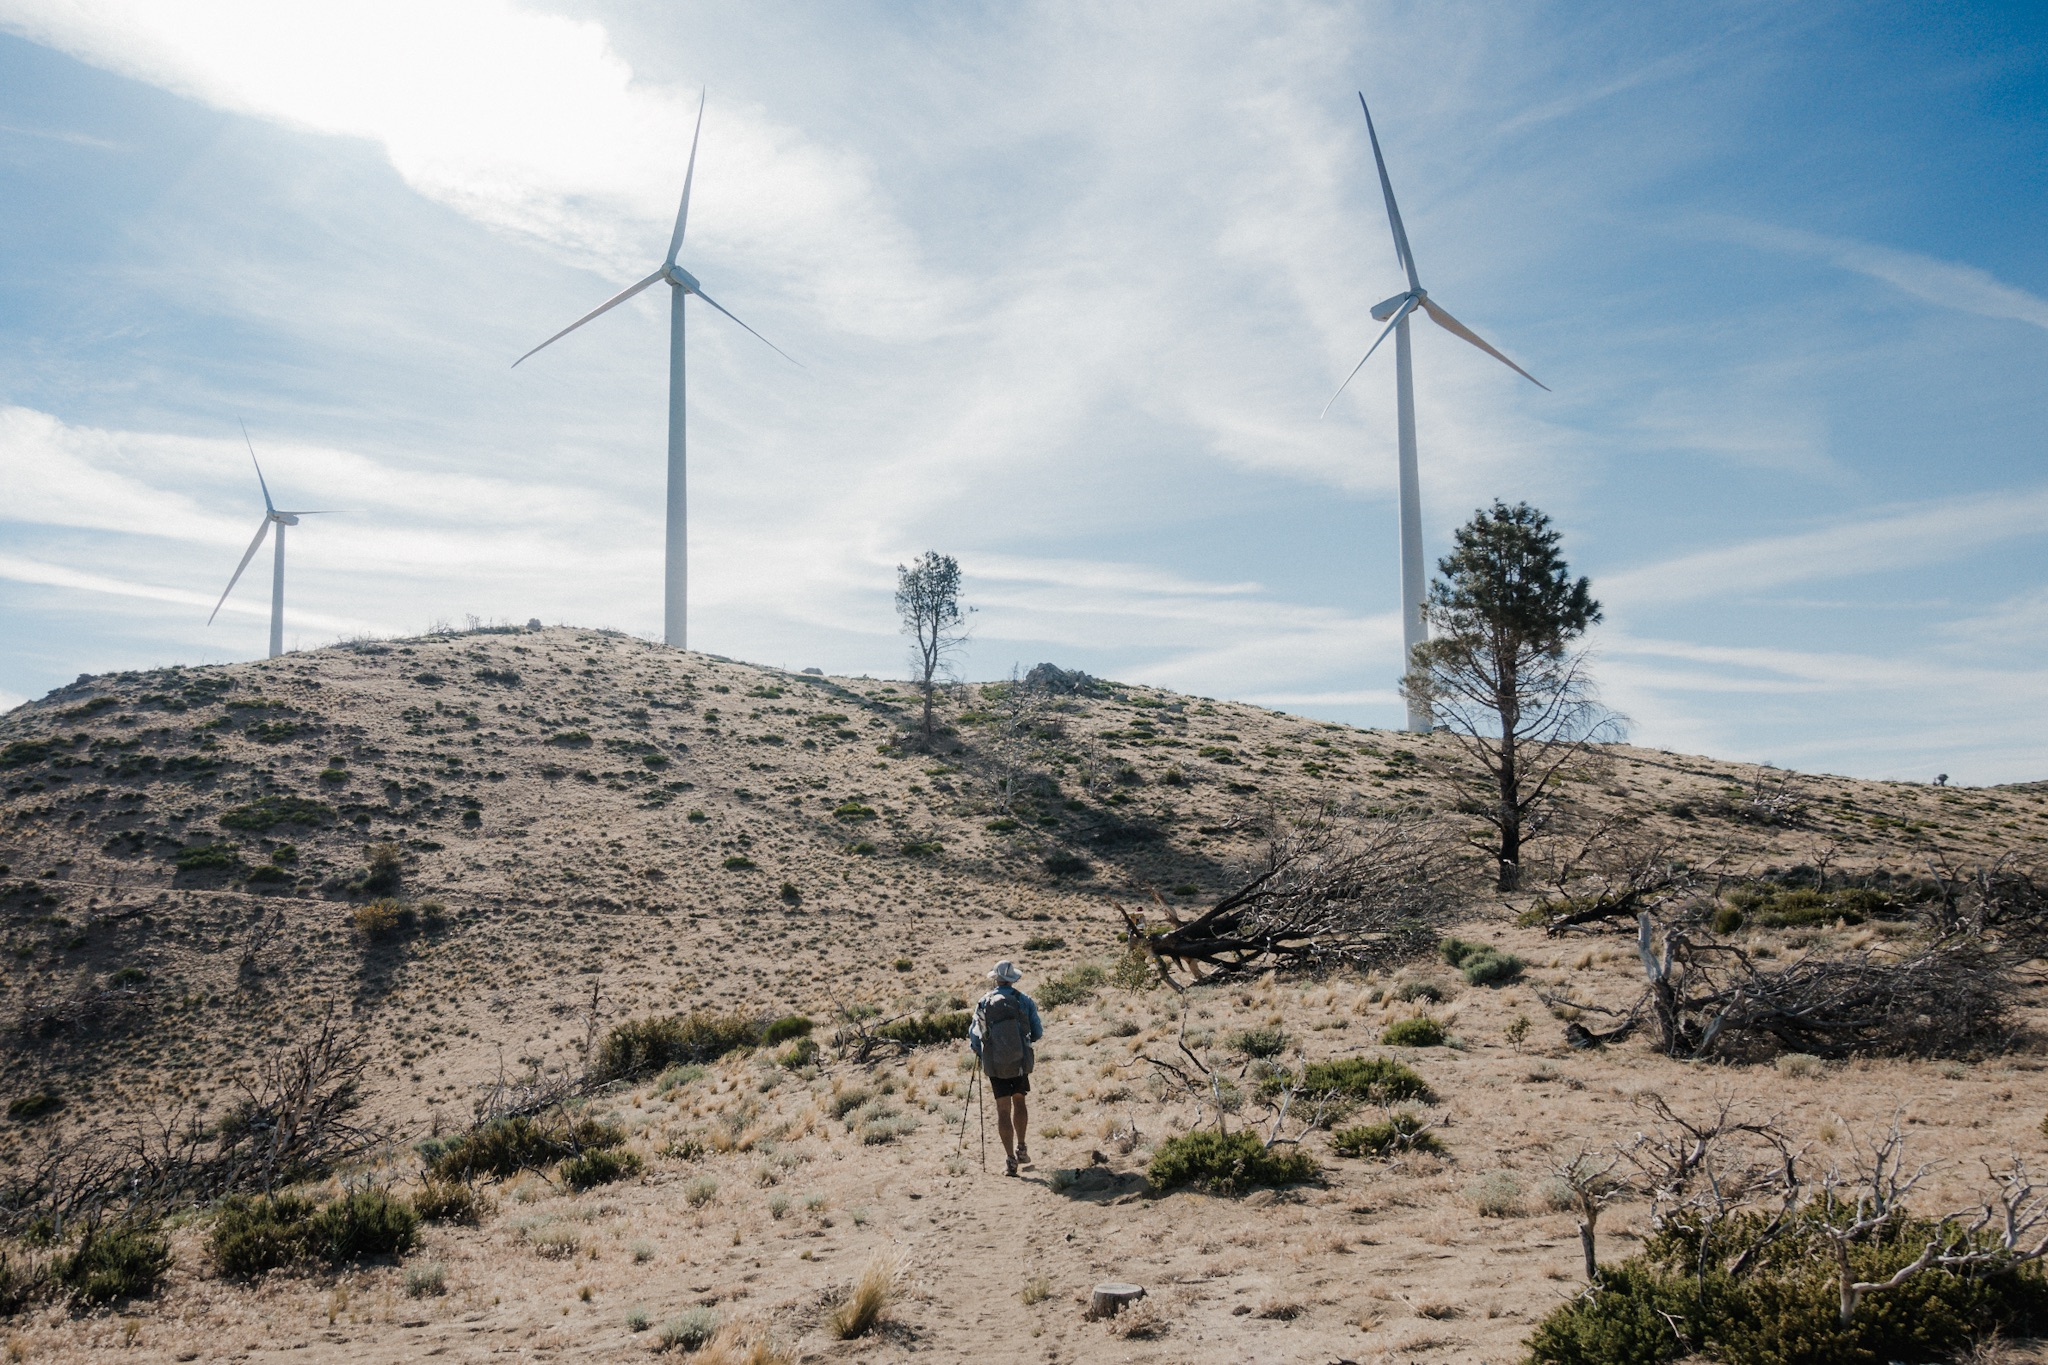 Blis among windmills.